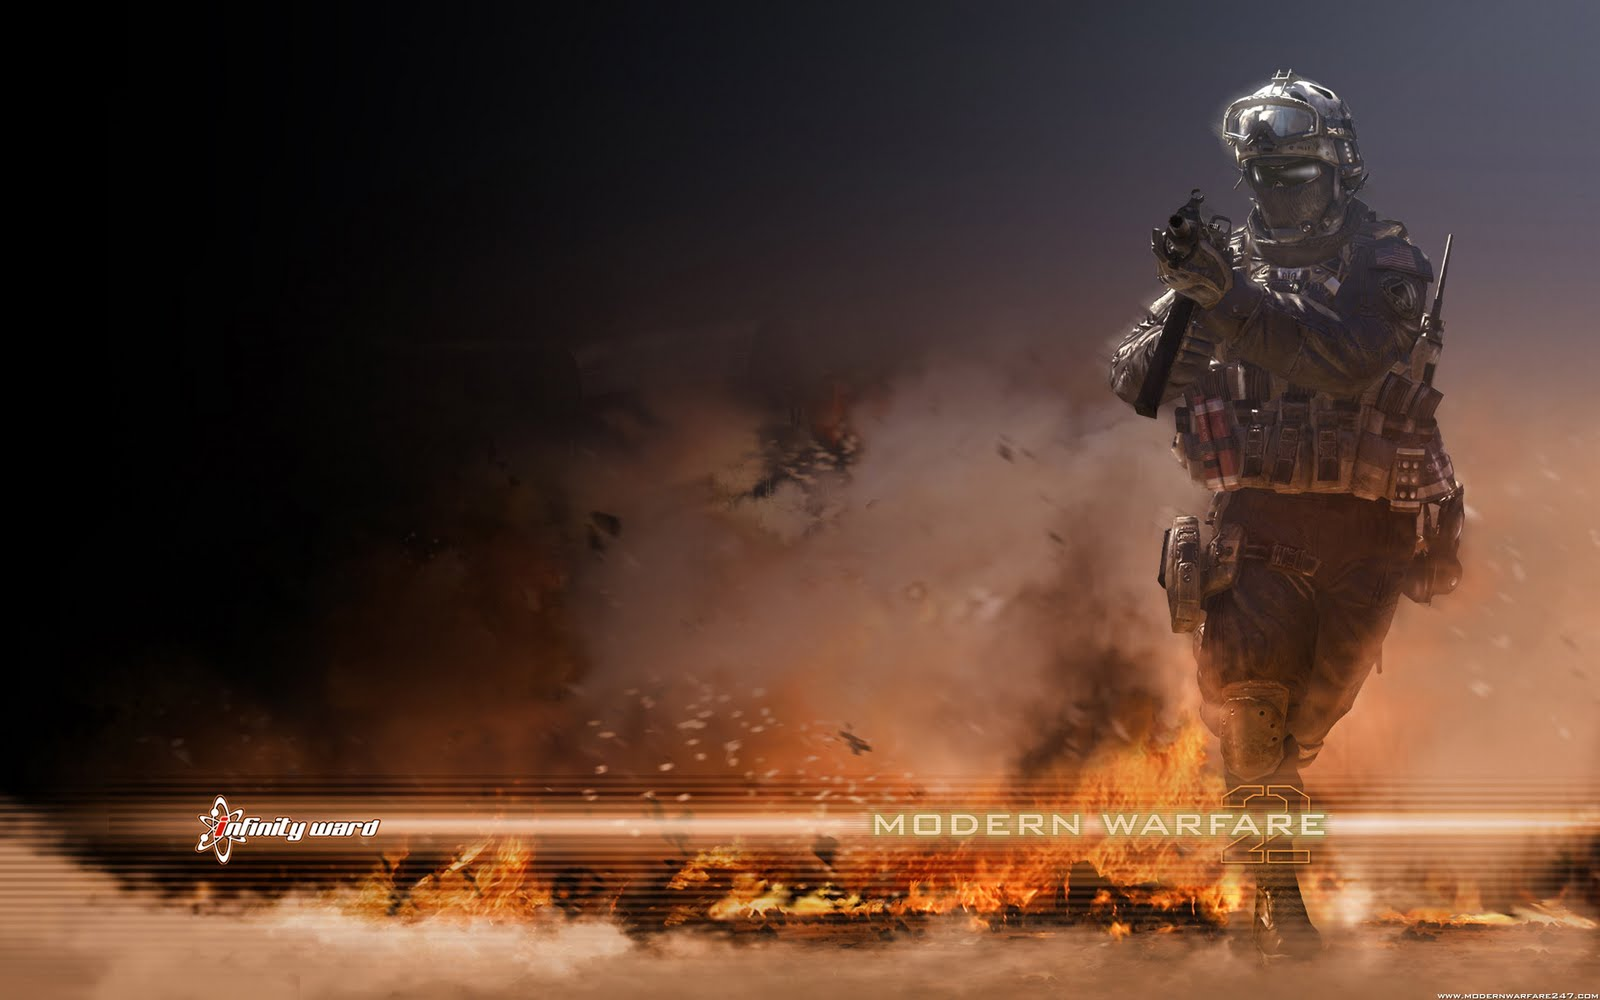 http://4.bp.blogspot.com/_sEvNEXRT9WI/S7VVE0YRi0I/AAAAAAAAACo/TPF3TuqbD6E/s1600/Modern+Warfare+2+Wallpaper.jpg